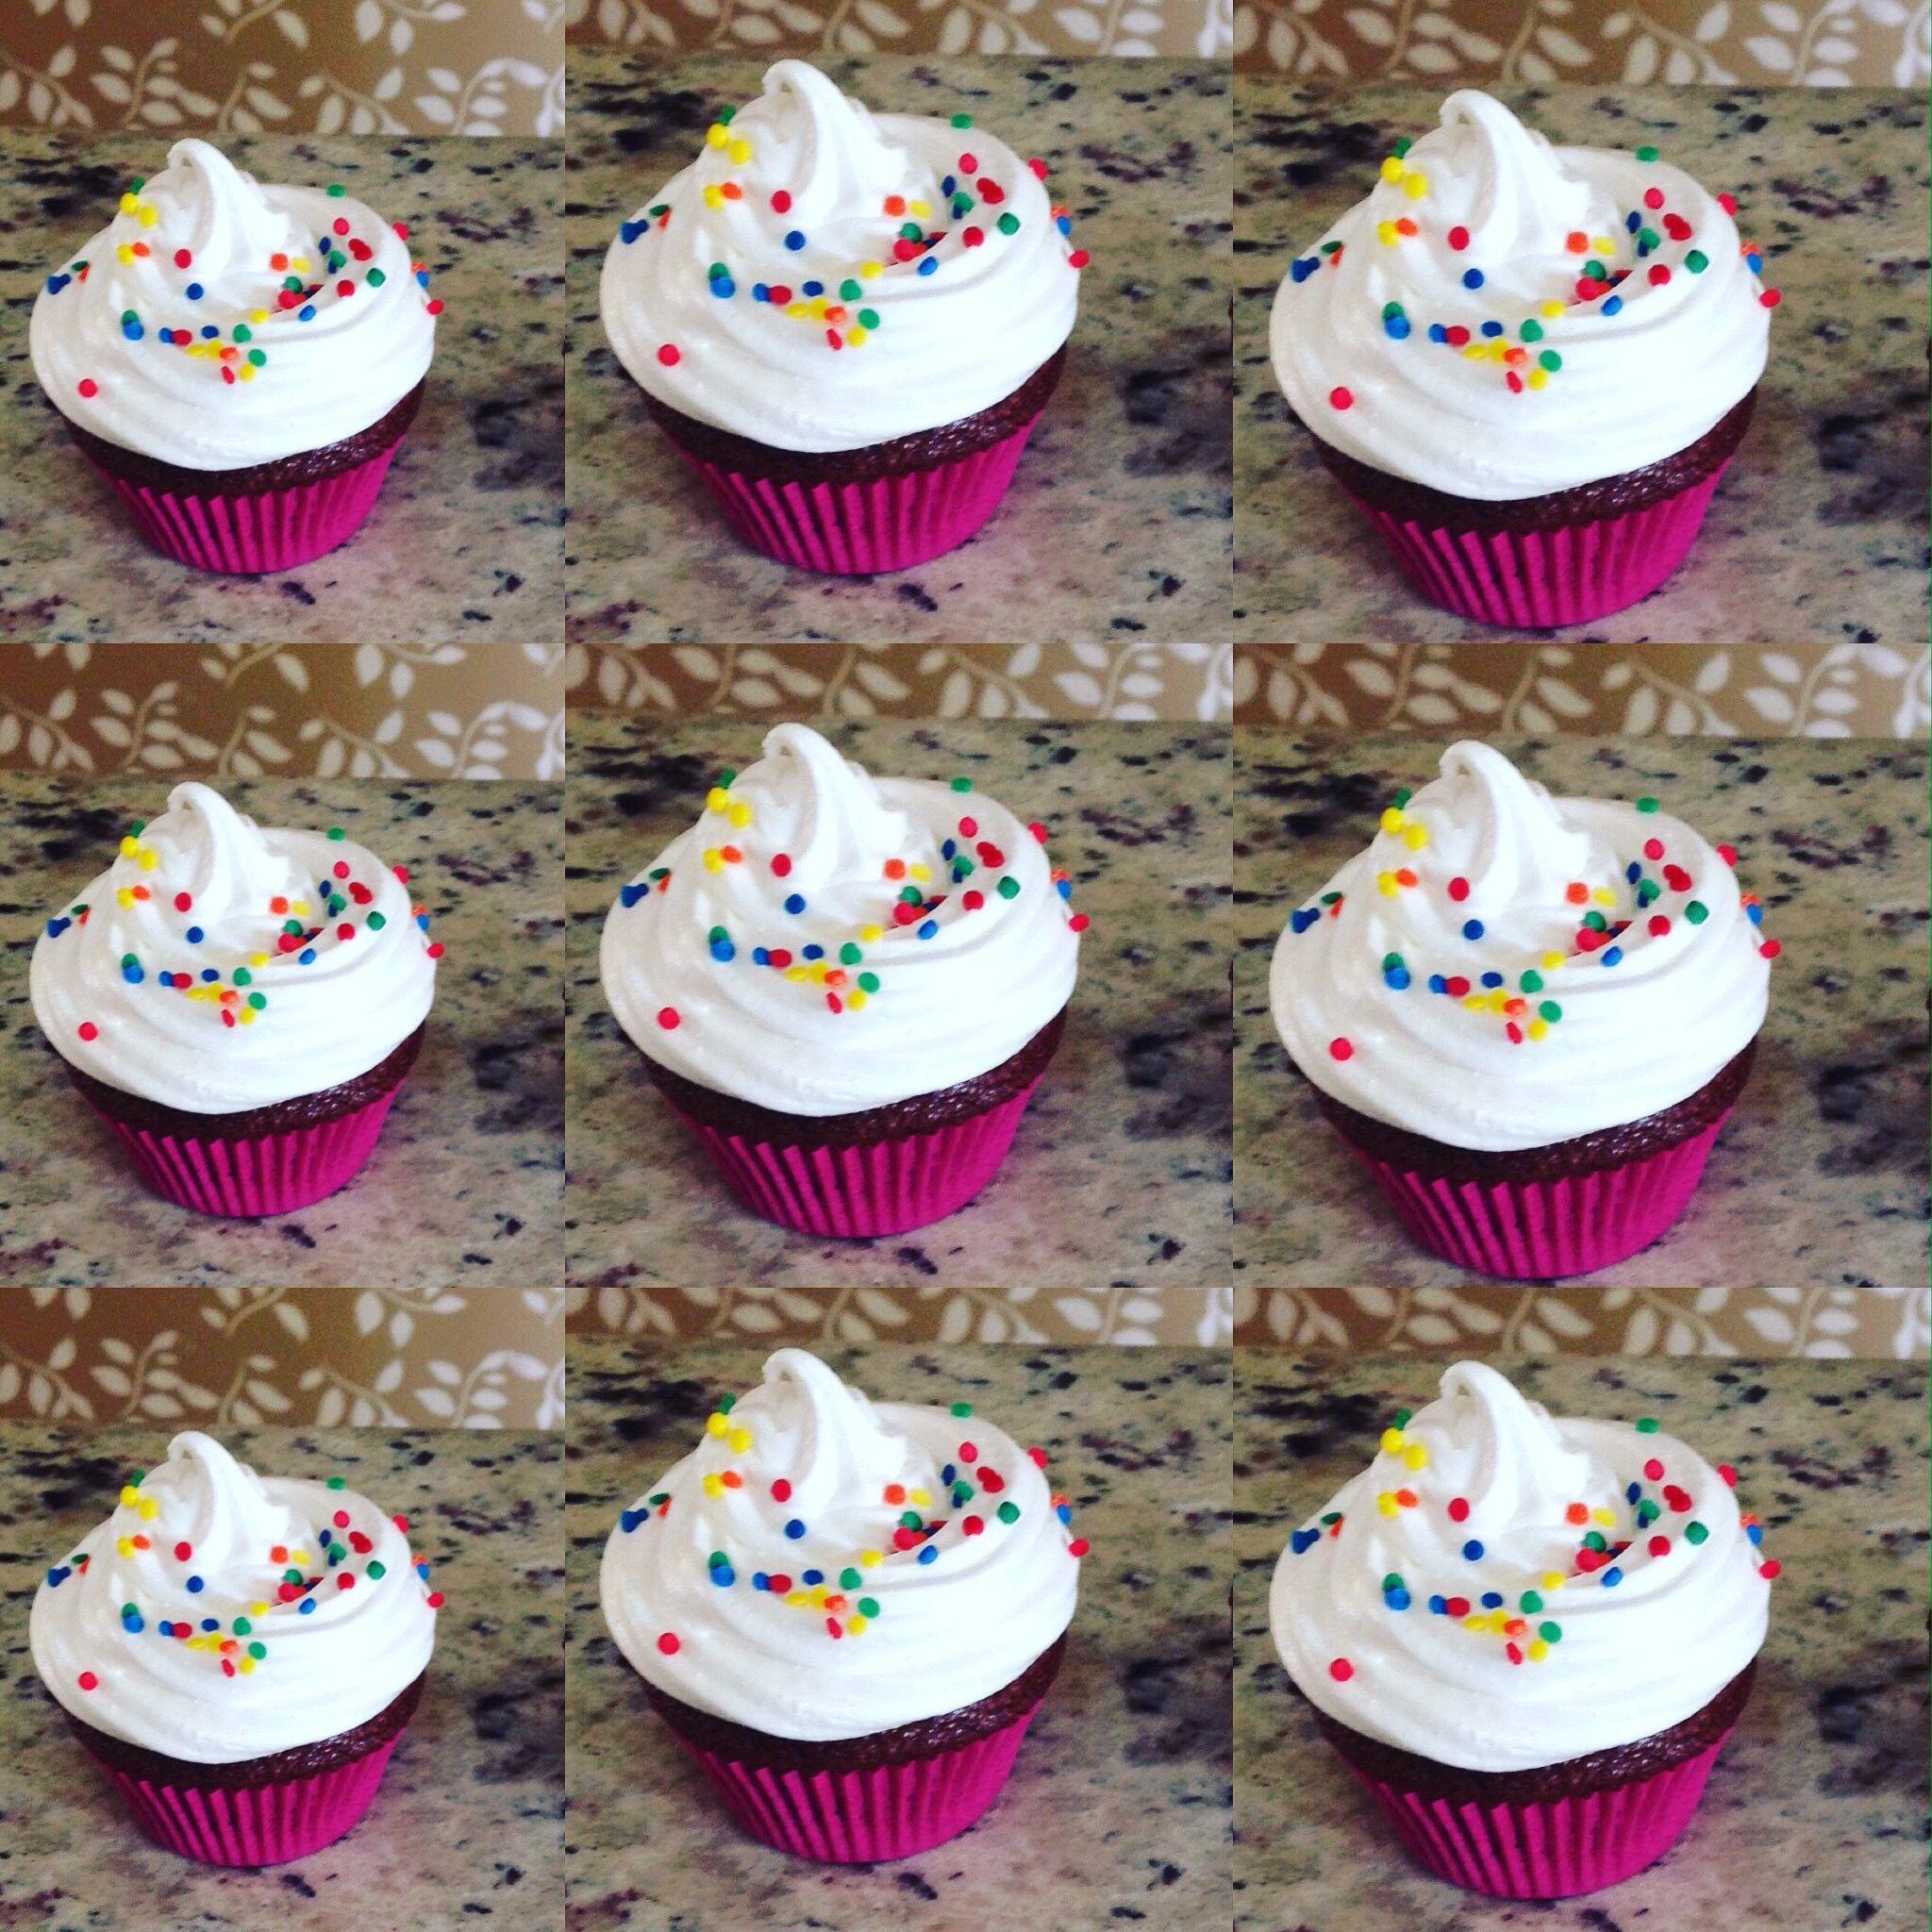 #deliciasdafaby #minicupcakesdeliciosos de marshmelow